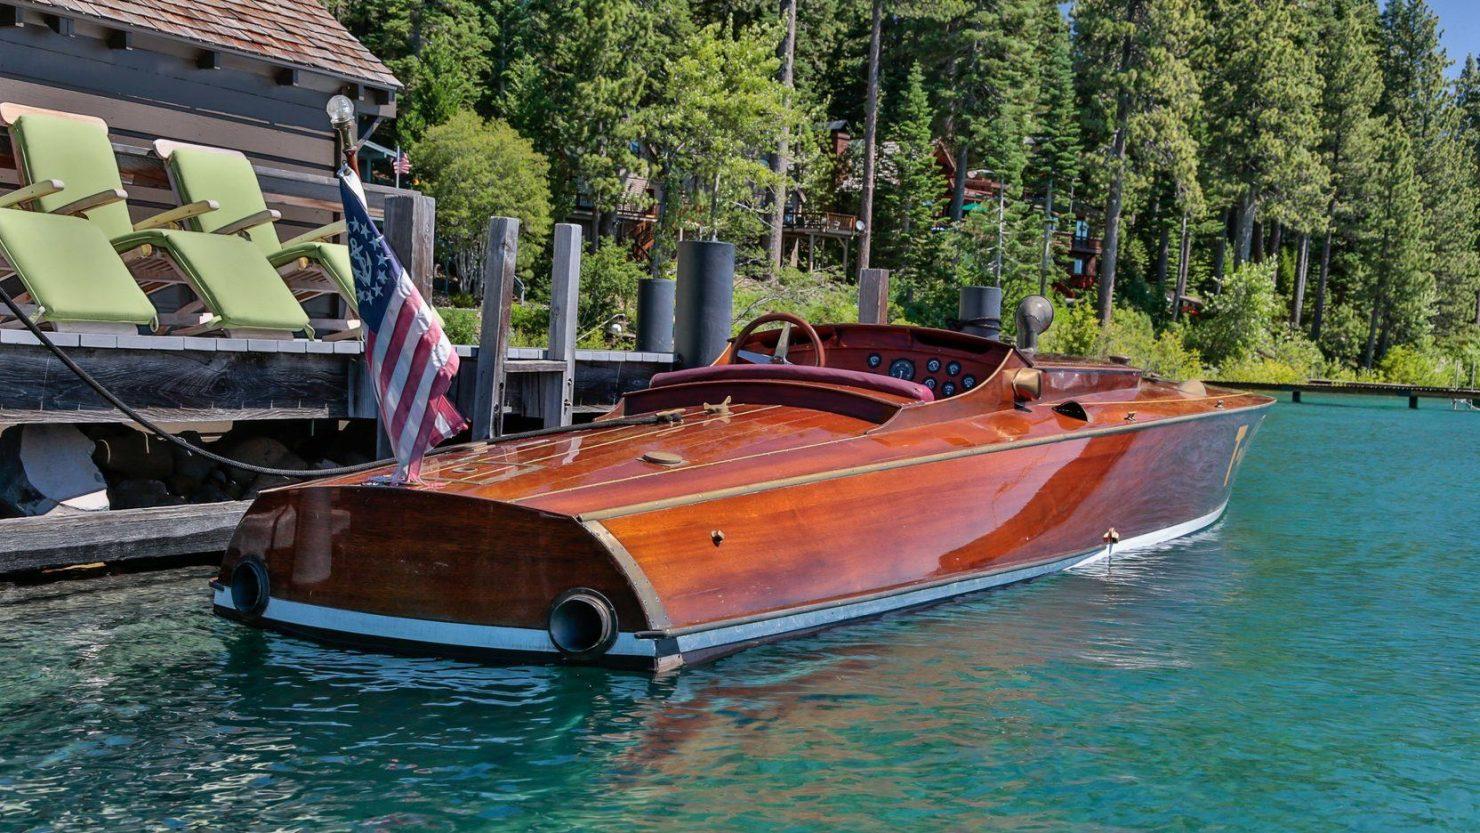 mahogany speed boat 6 1480x833 - 27 Liter V12 Brown & Bassett Gentleman's Racer